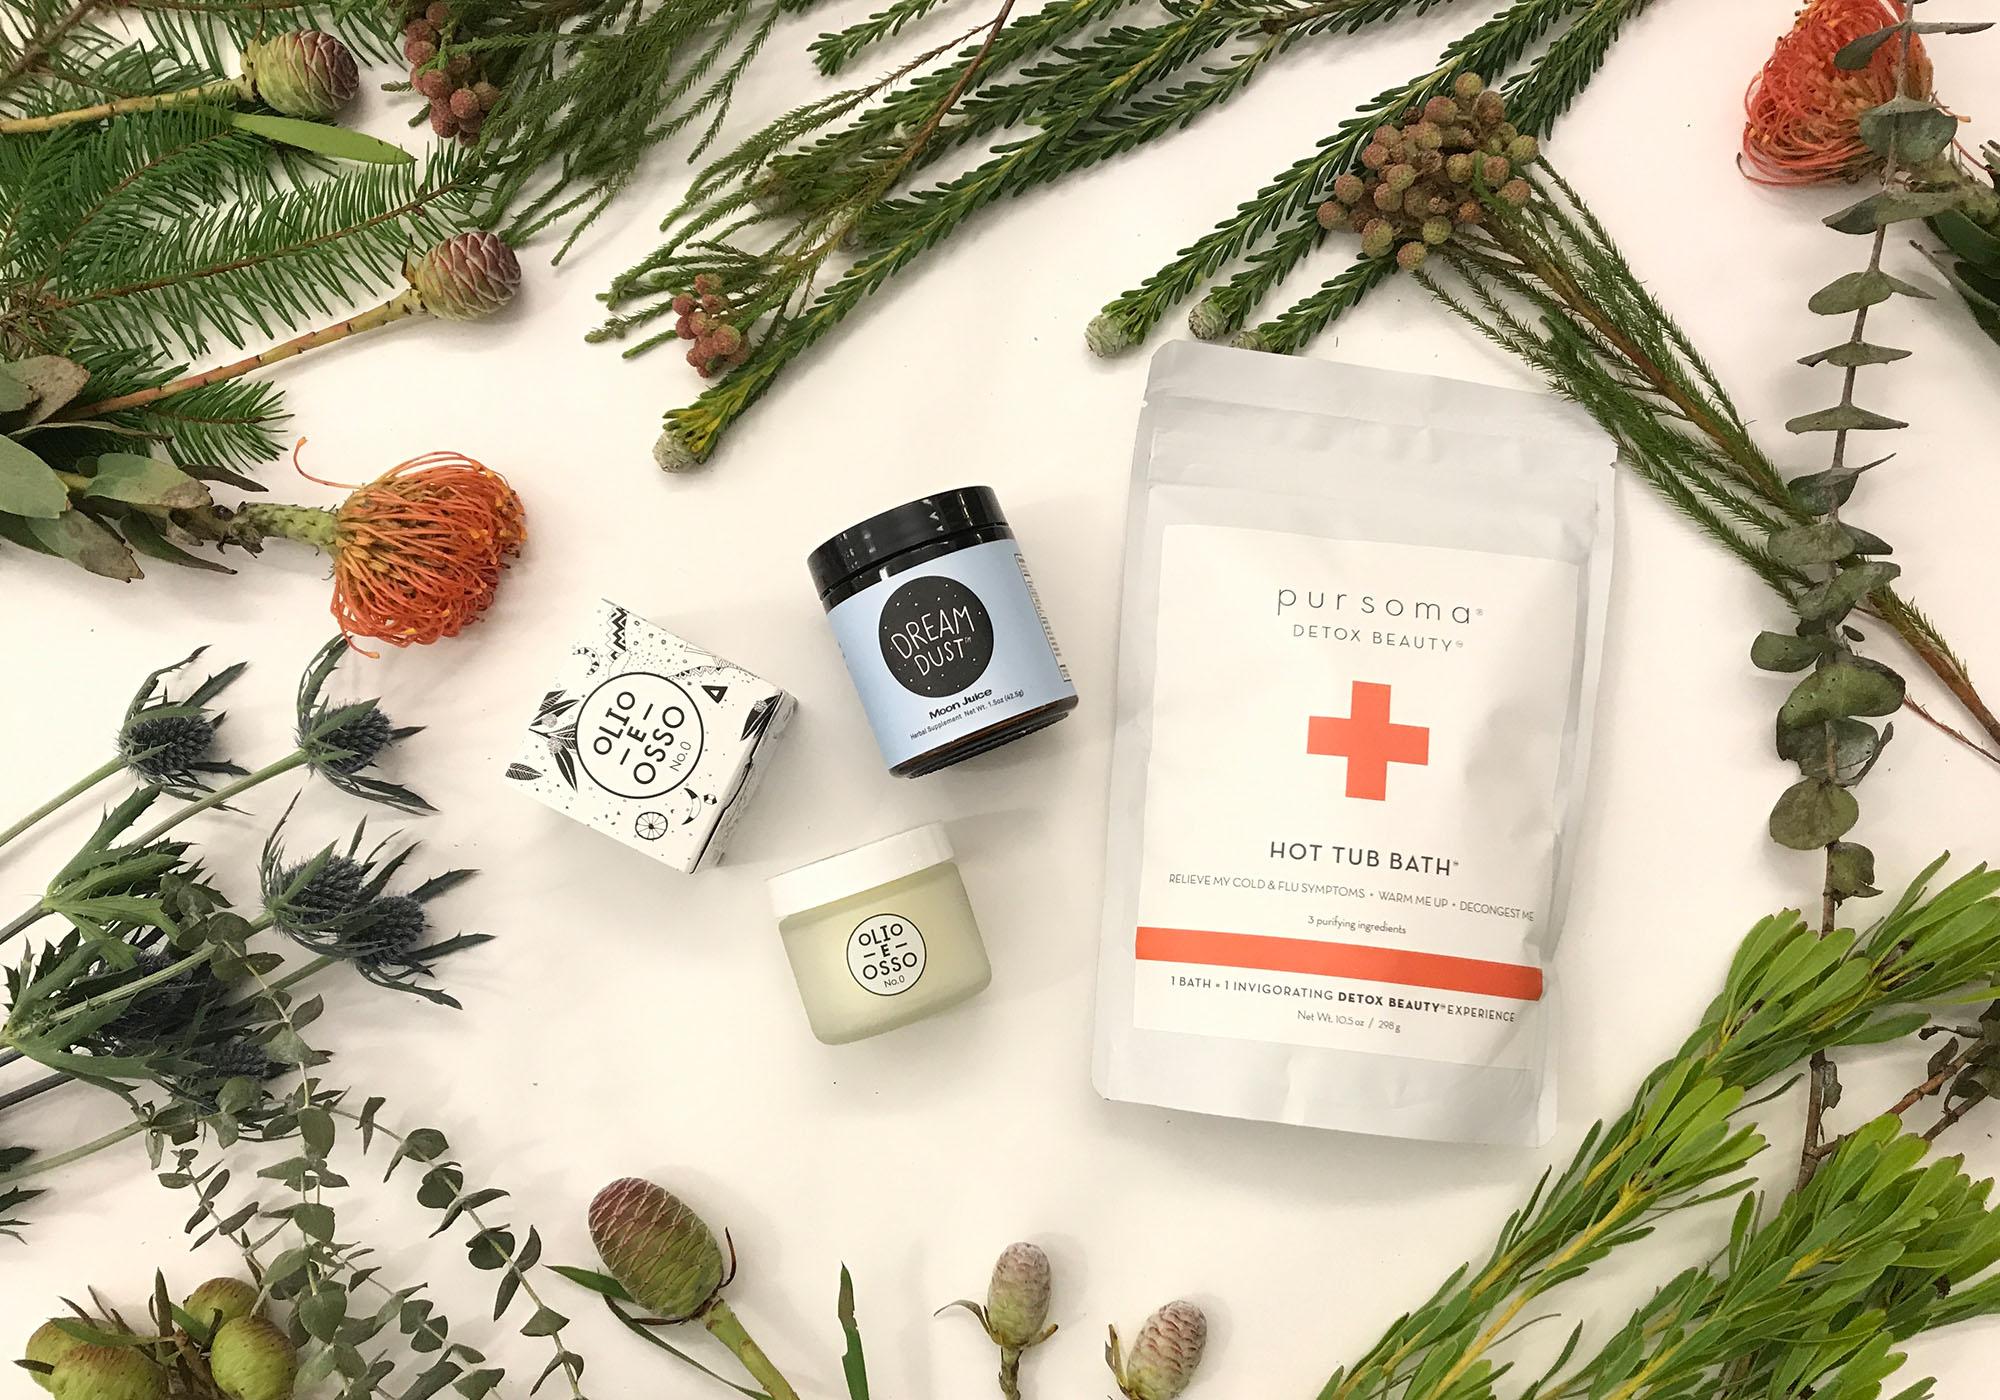 Wellness is Beautiful - purge those flu bugs